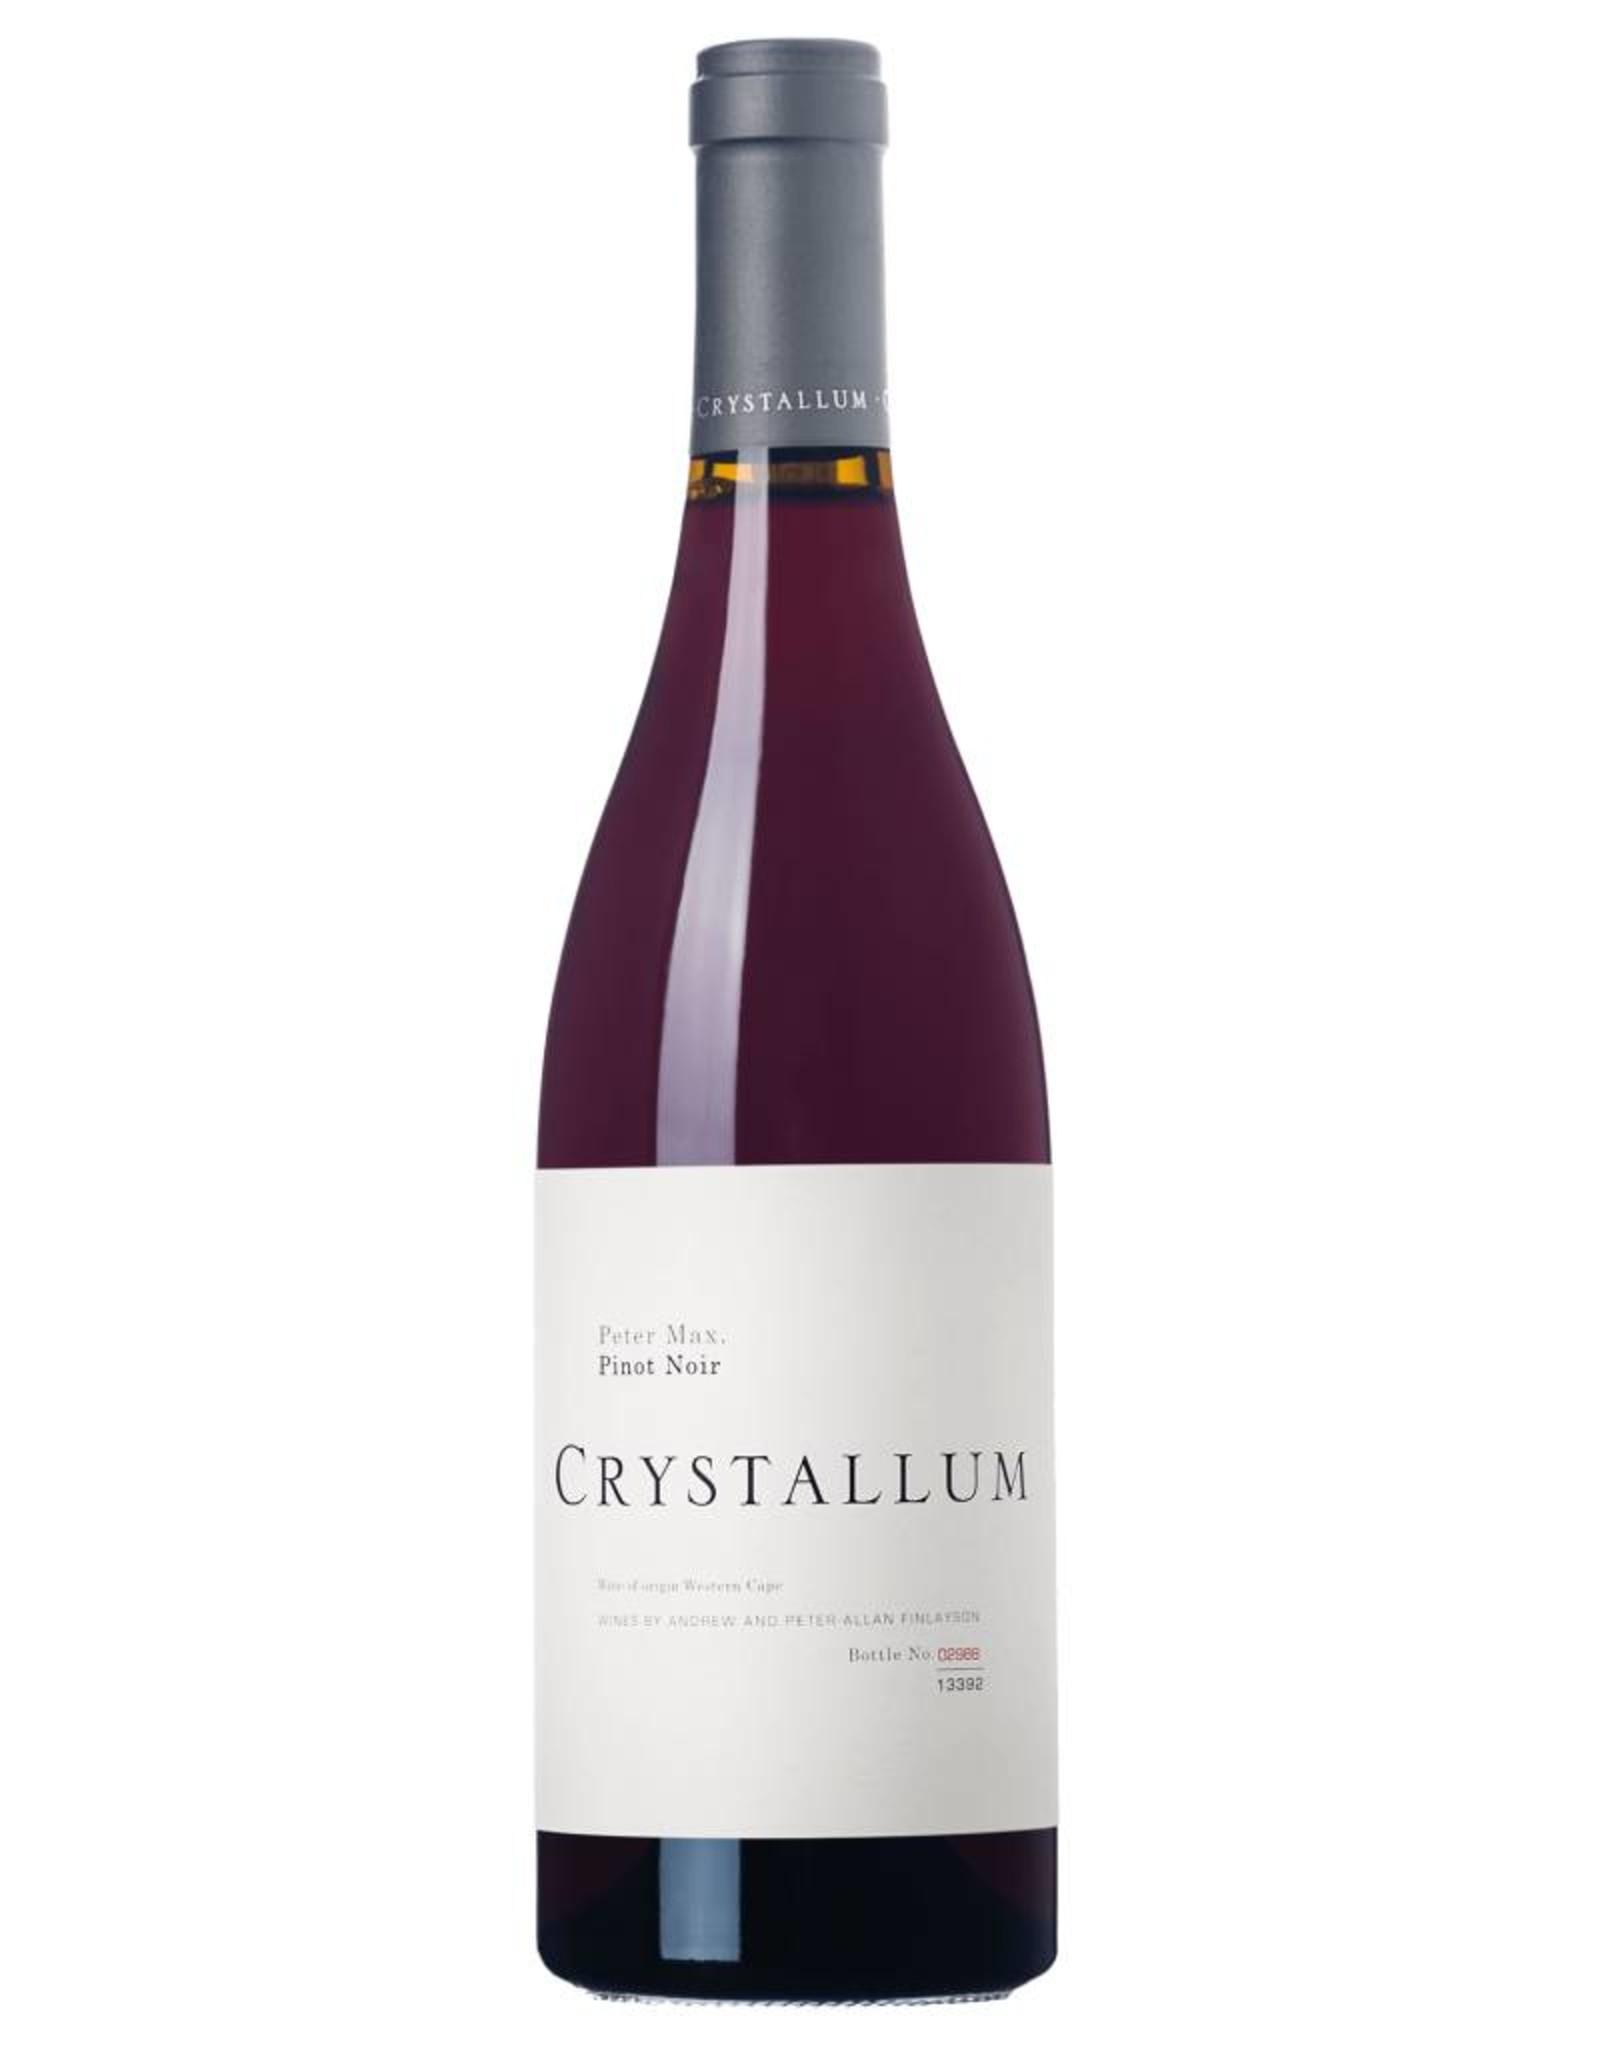 Crystallum - Peter Max Pinot Noir